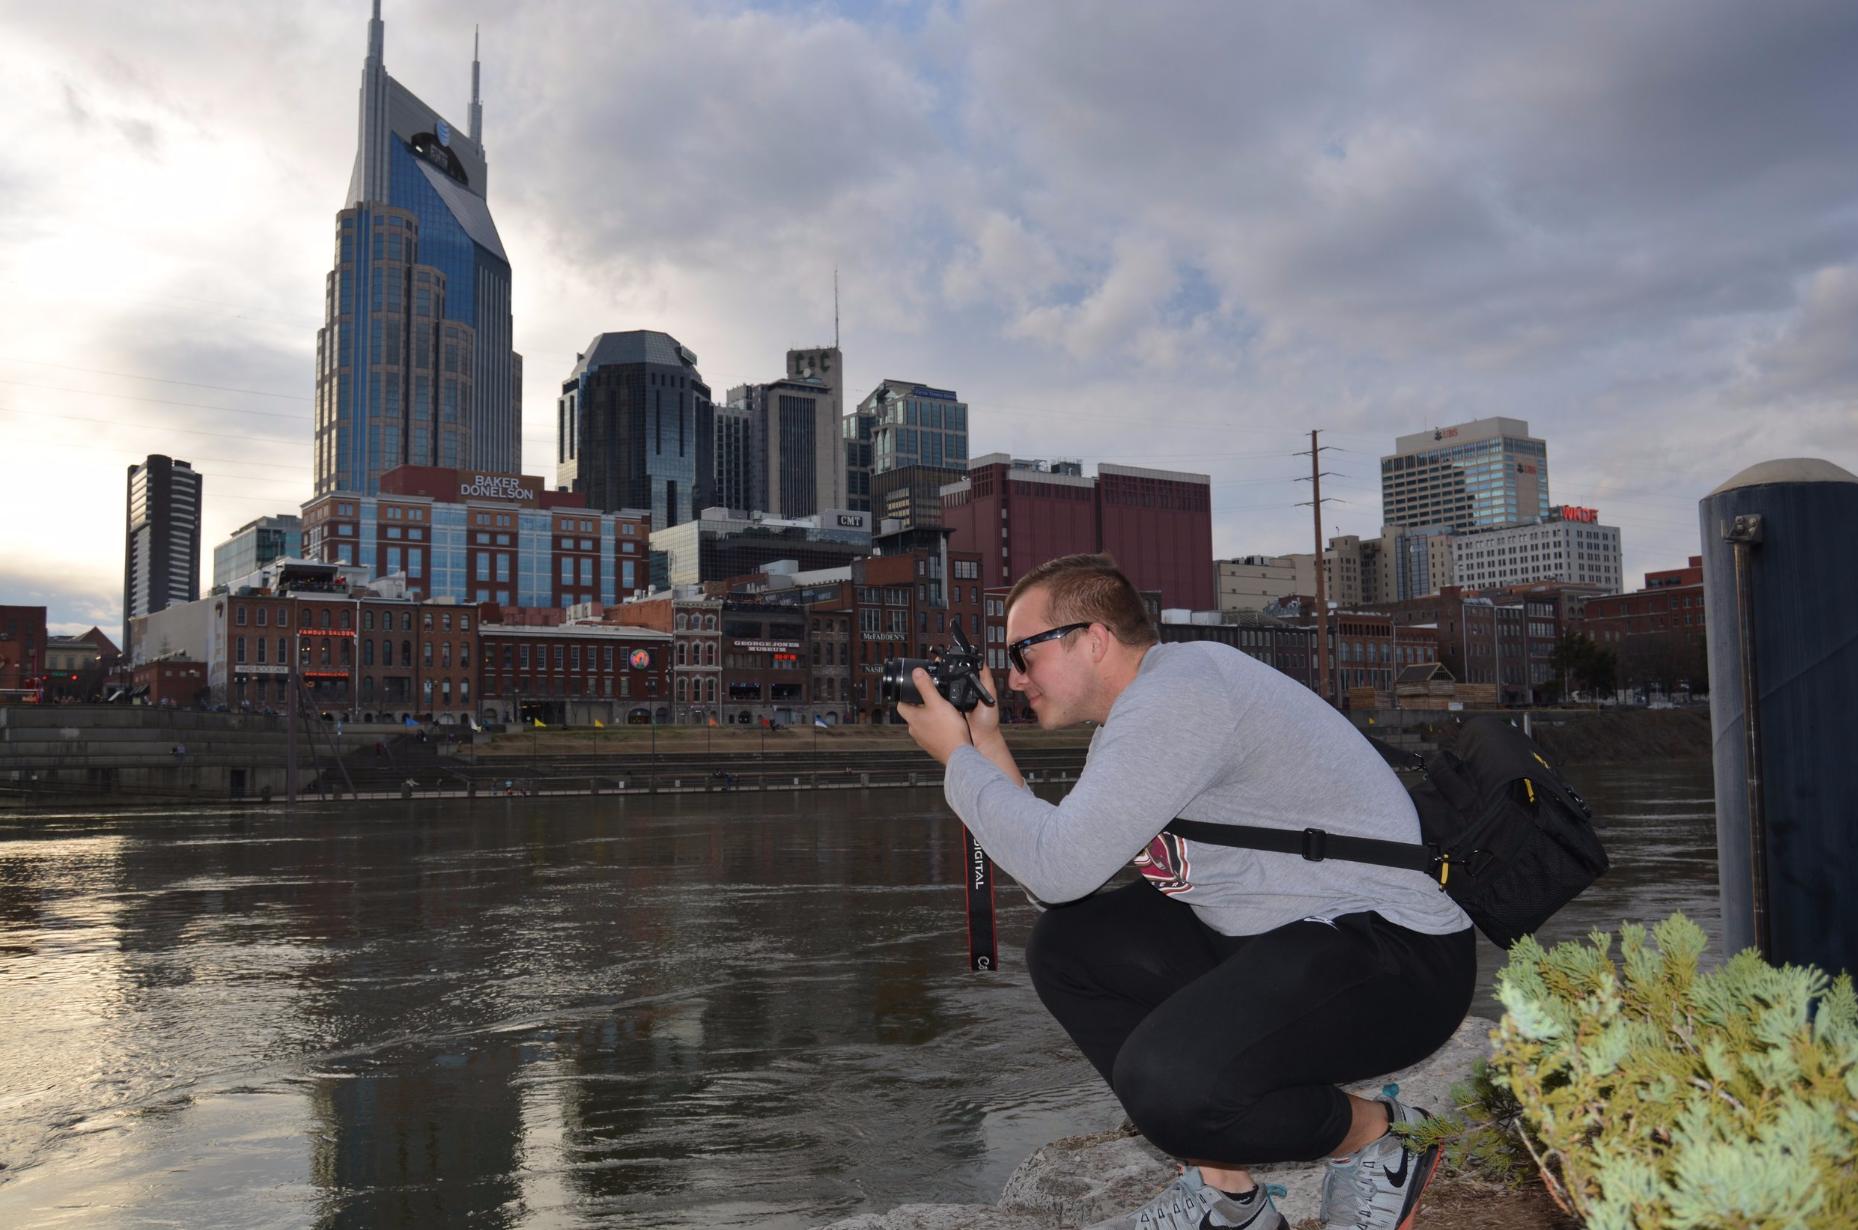 Nashville photography internship 8.png